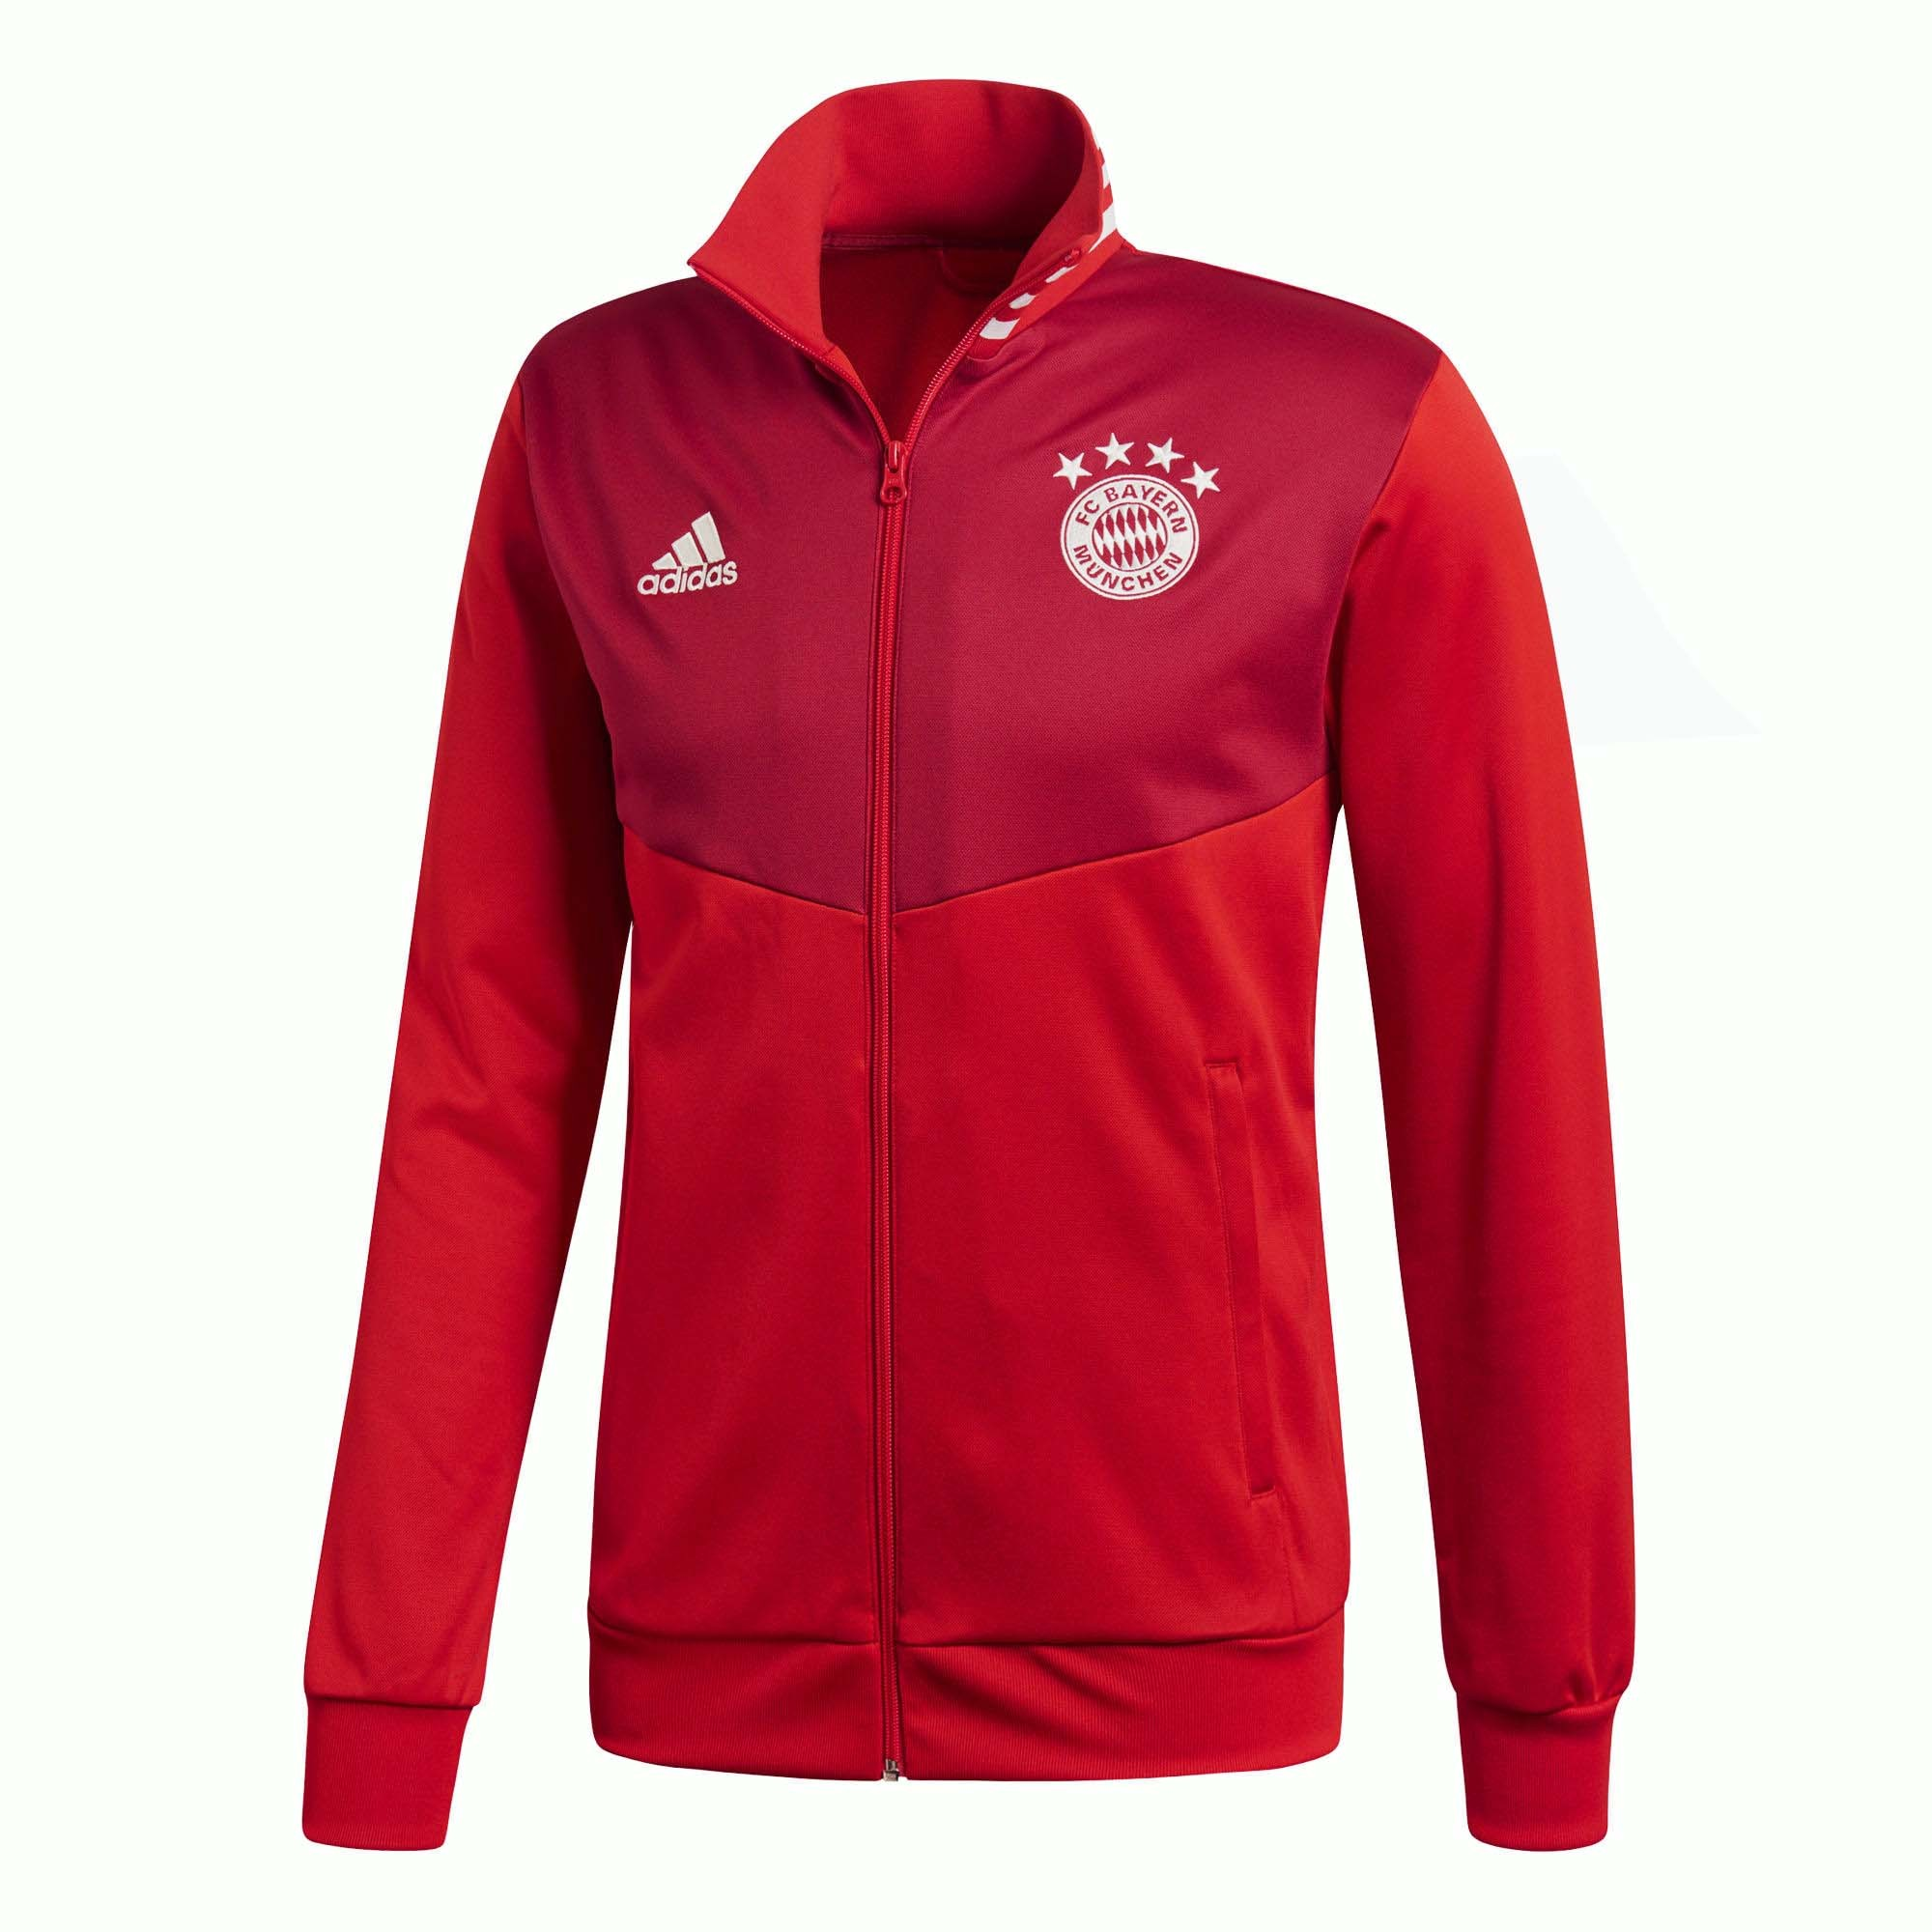 ee289855b Campera Adidas FC Bayern Munich 3 tiras rojo/Blanco Hombre Deporfan ...